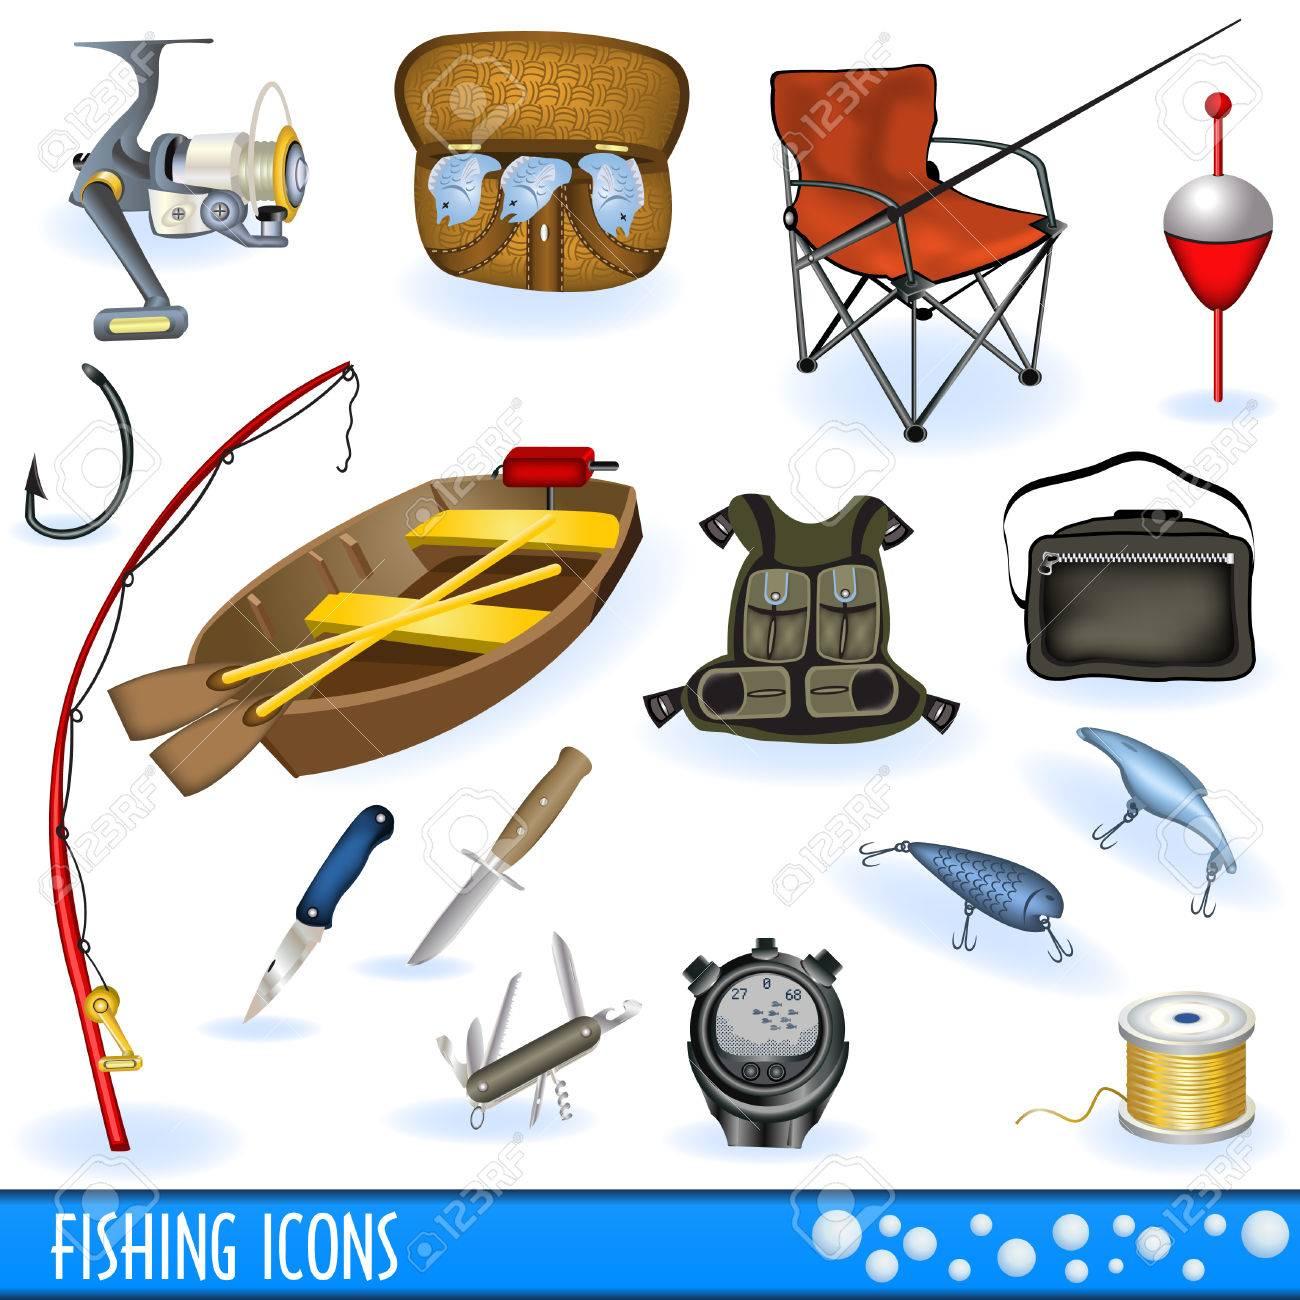 Fishing icons - 8307048